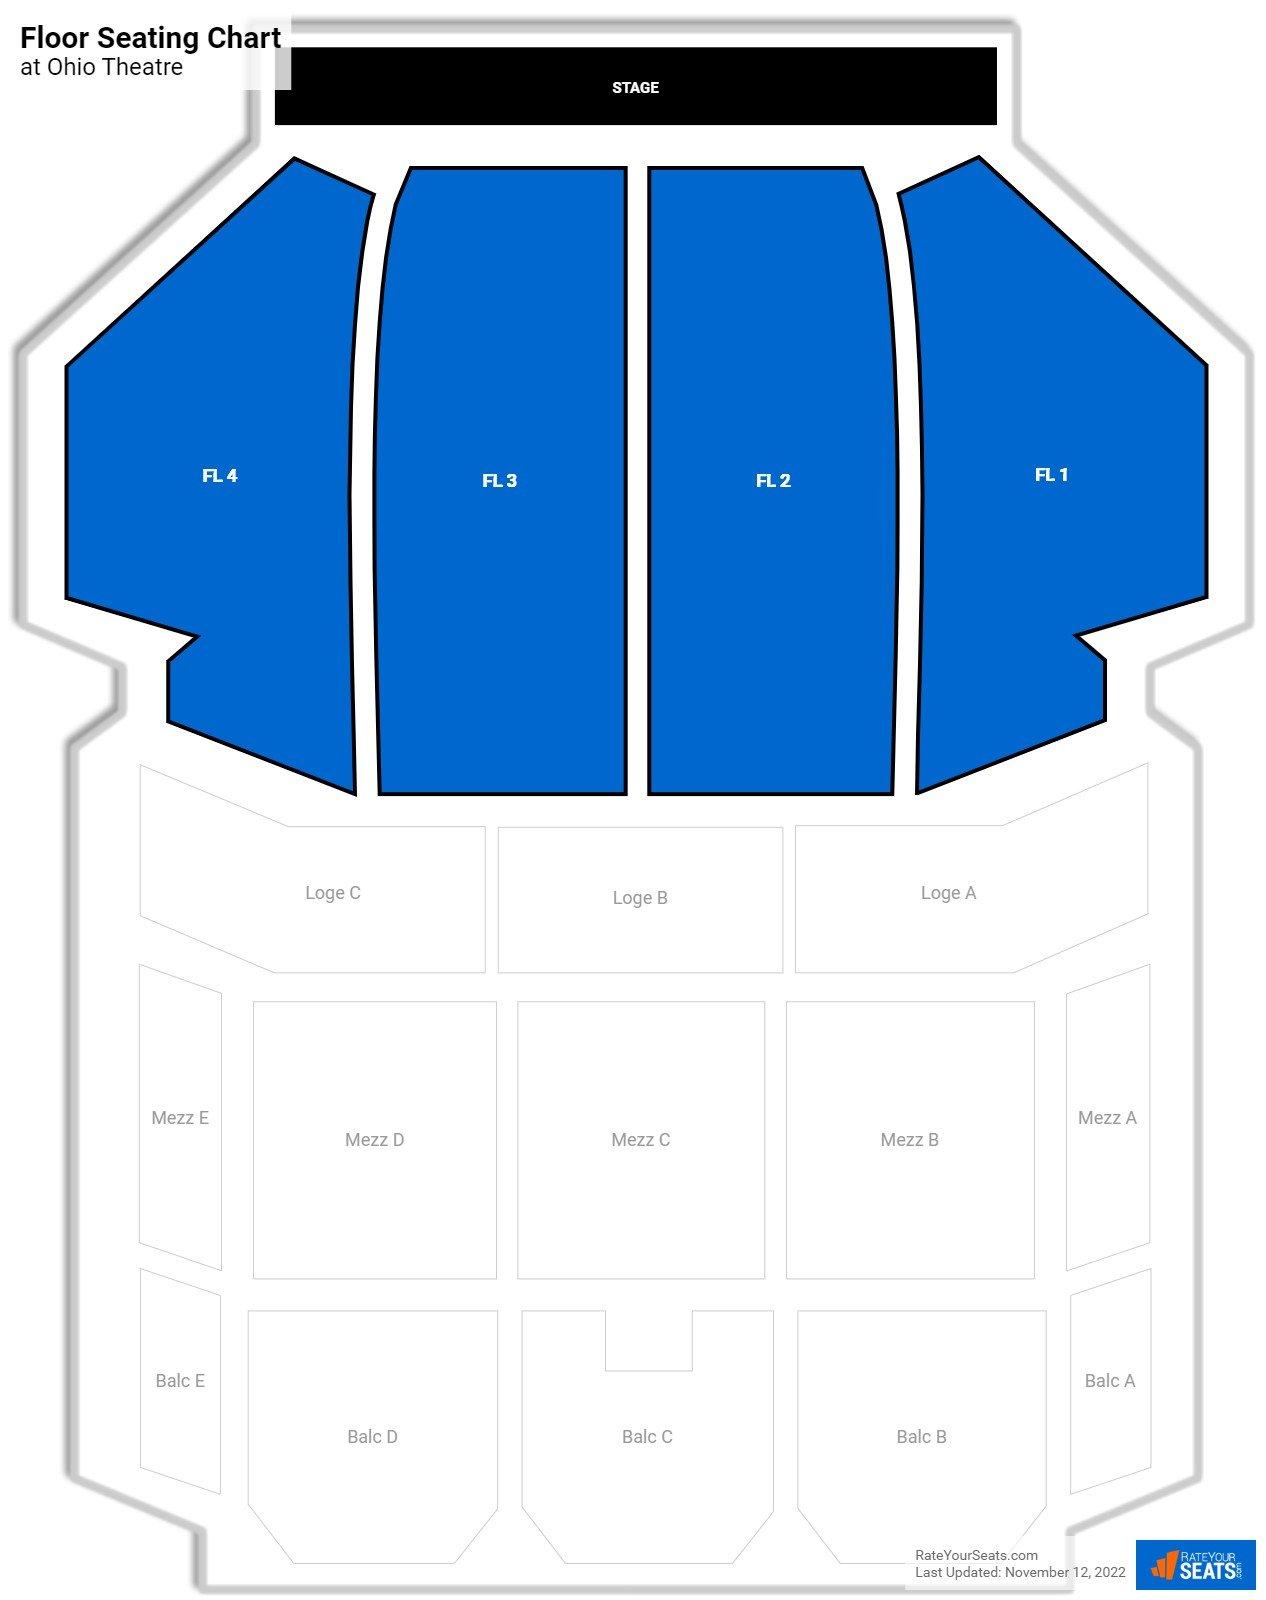 Ohio Theatre Floor Theater Seating Rateyourseats Com